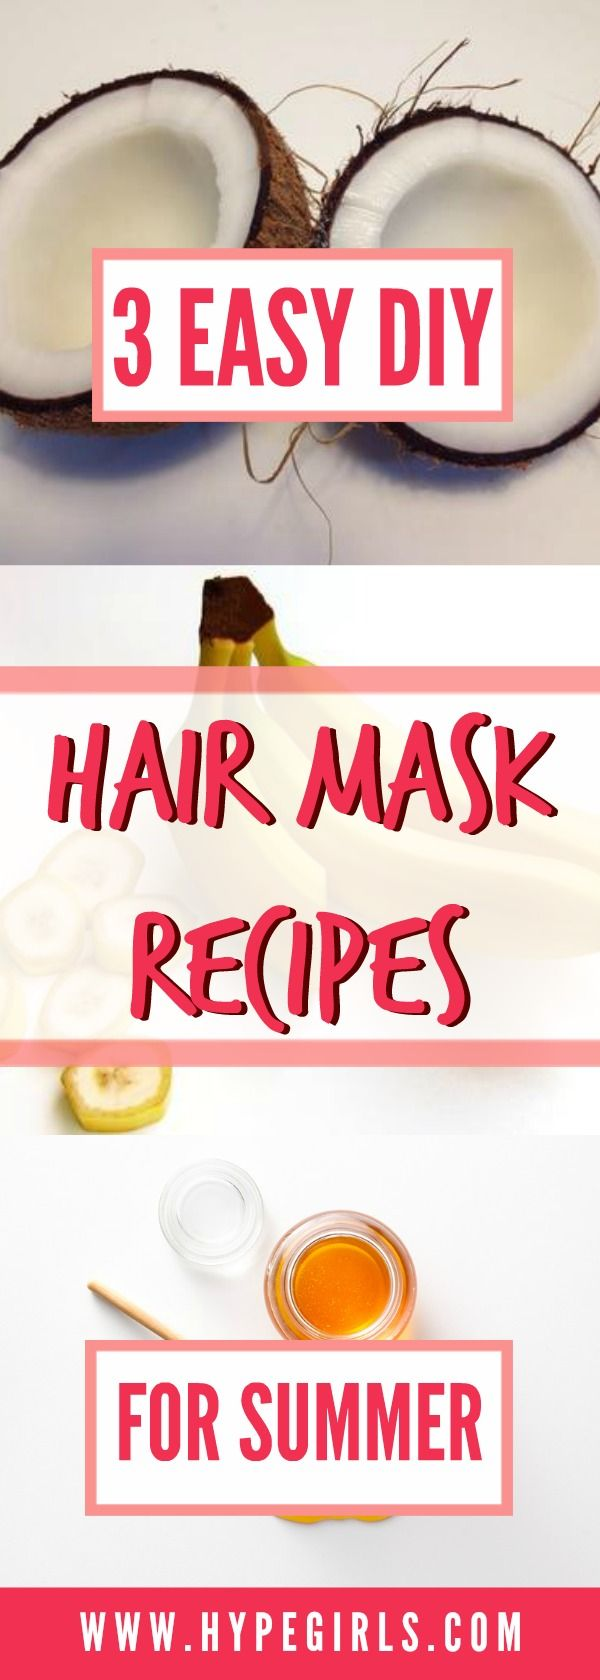 Try these amazing DIY hair masks this summer! DIY | Hair Mask | Haircare | Beauty | Organic | Natural | Homemade | Crunchy Mama | Summer | Recipes | HSI Professional | Hair Damage | Sun Damage | Dry Hair | Frizzy Hair | Softer Hair | Shop| HypeGirls |